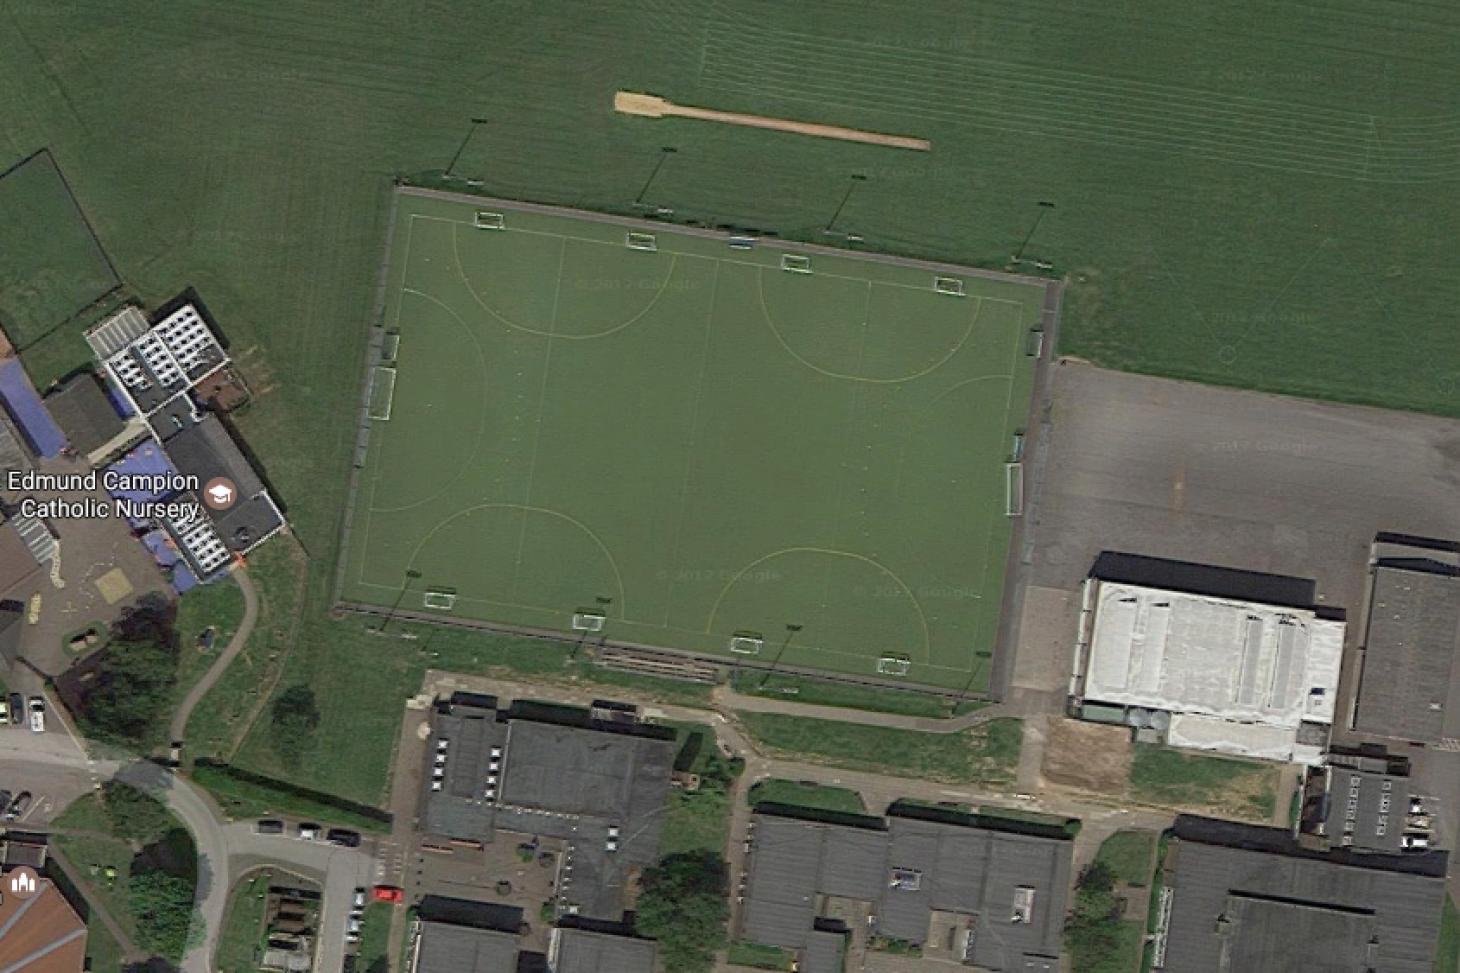 Altwood Church of England School 11 a side   Astroturf football pitch